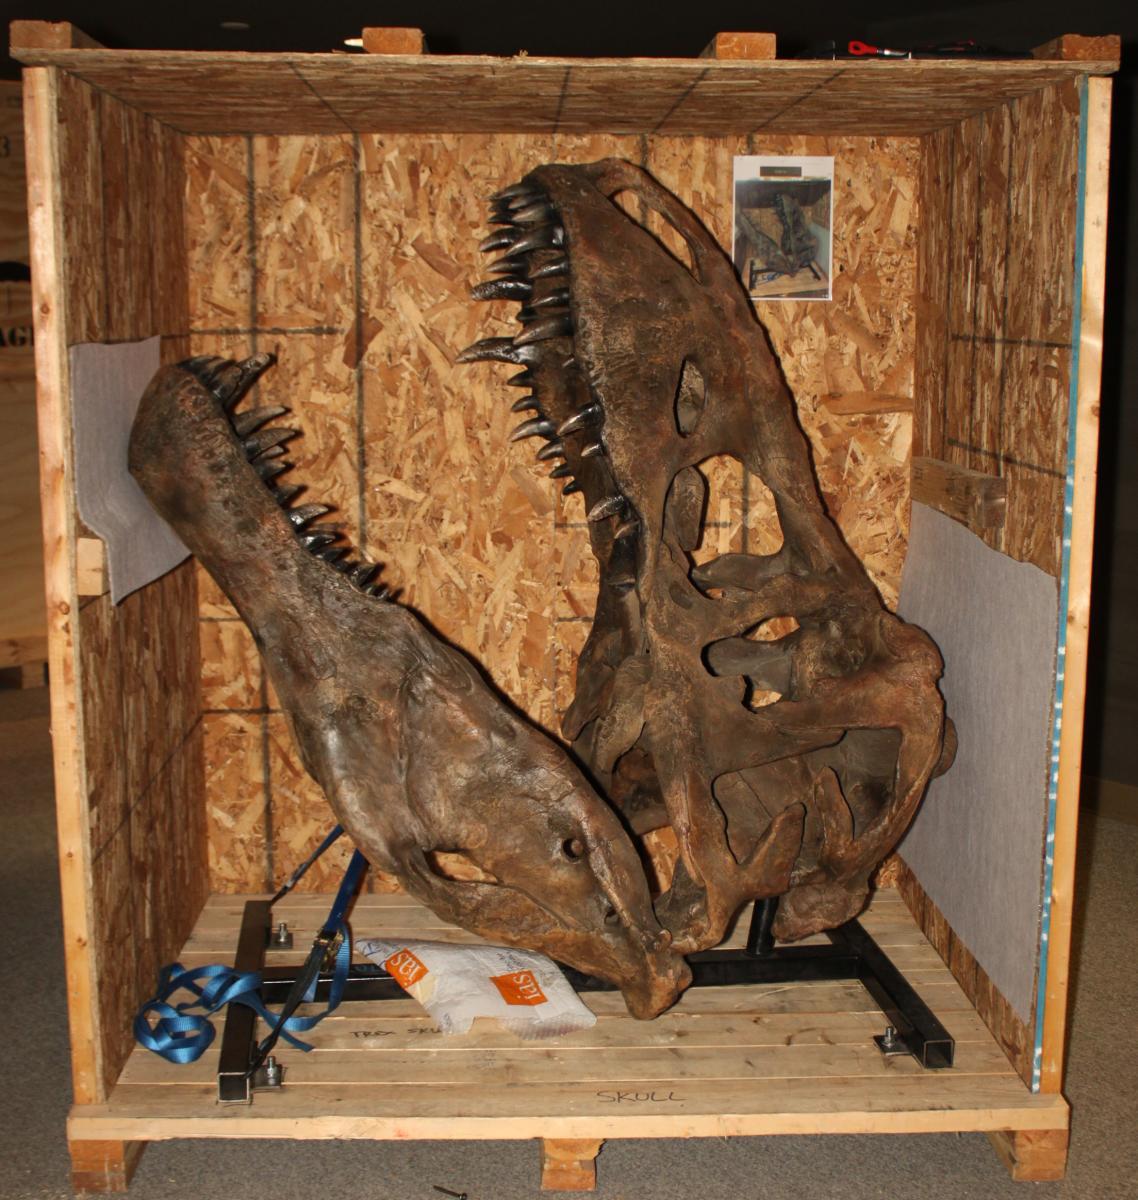 Tyrannosaurs: Meet the Family